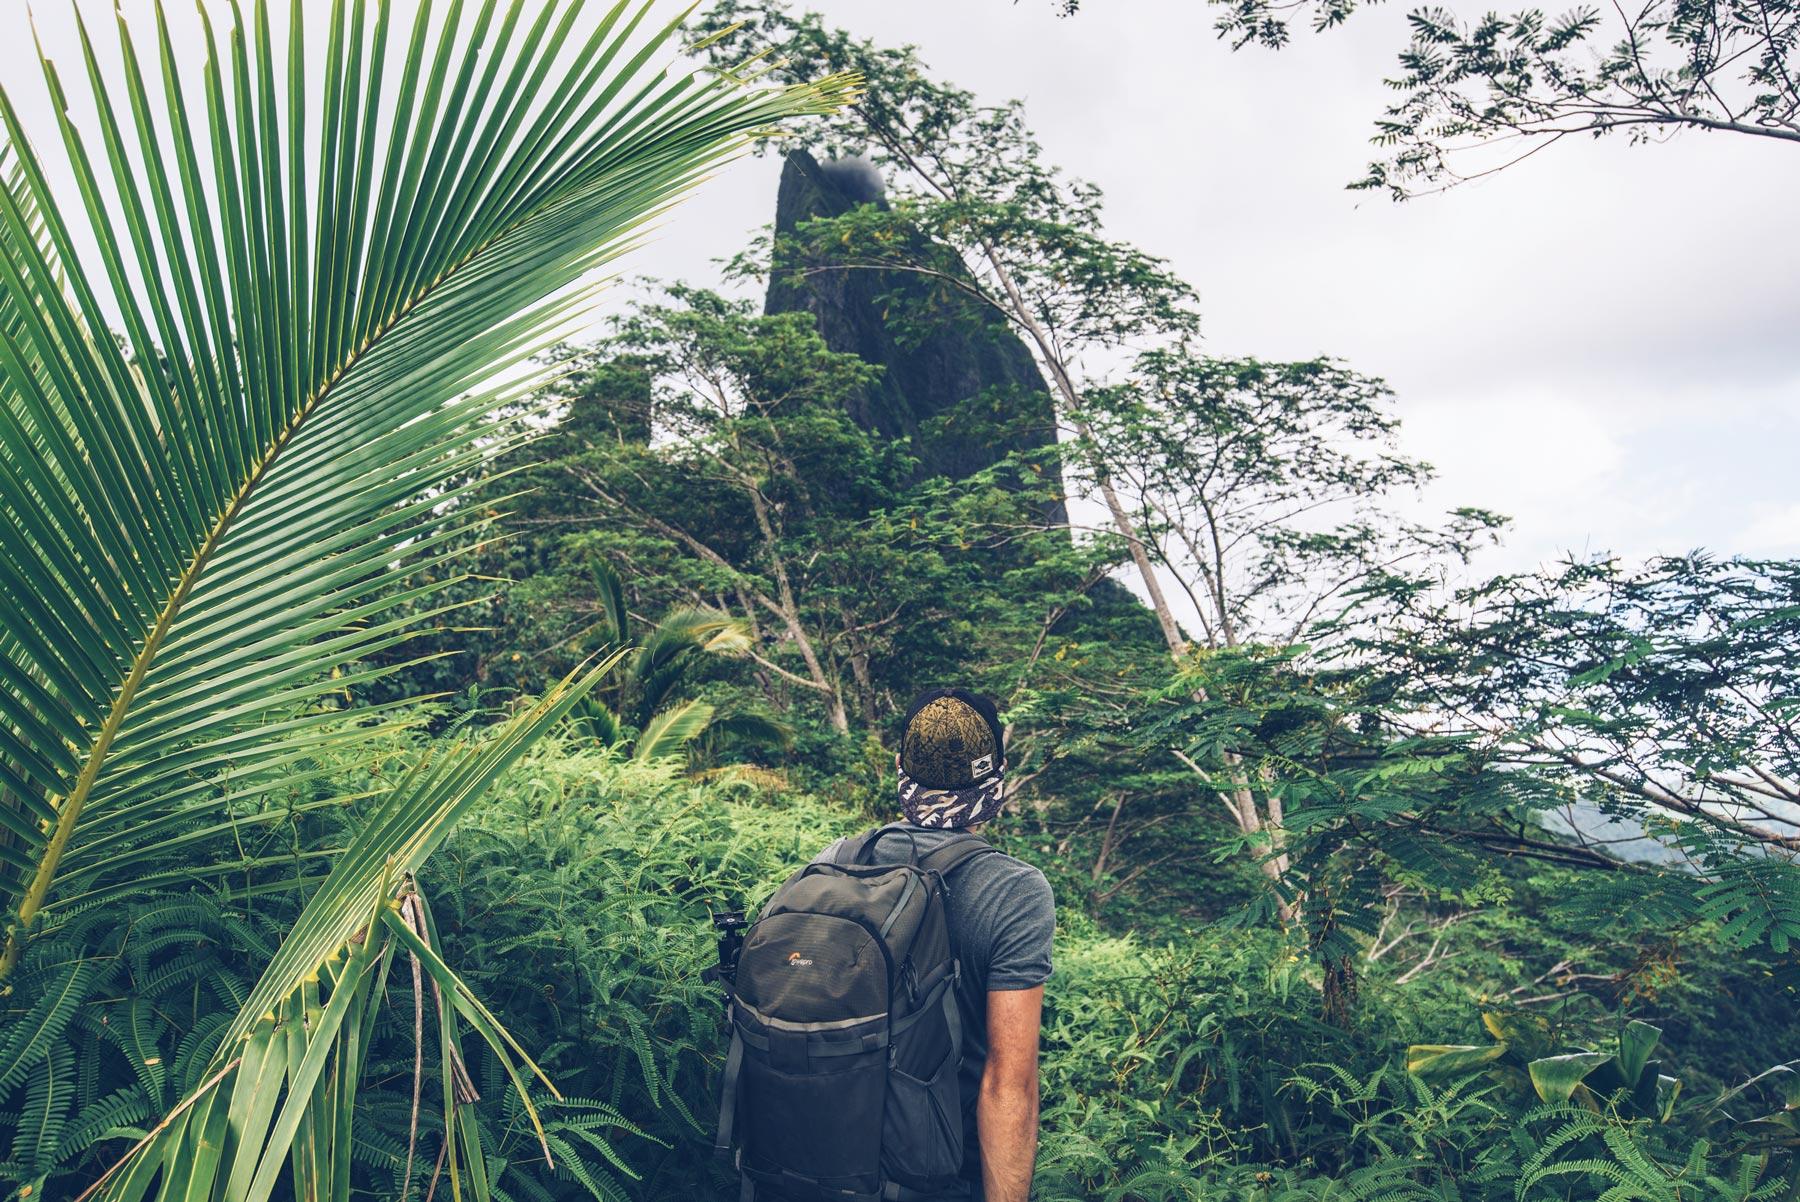 Rando du col des 3 cocotiers, Moorea, Polynésie Française